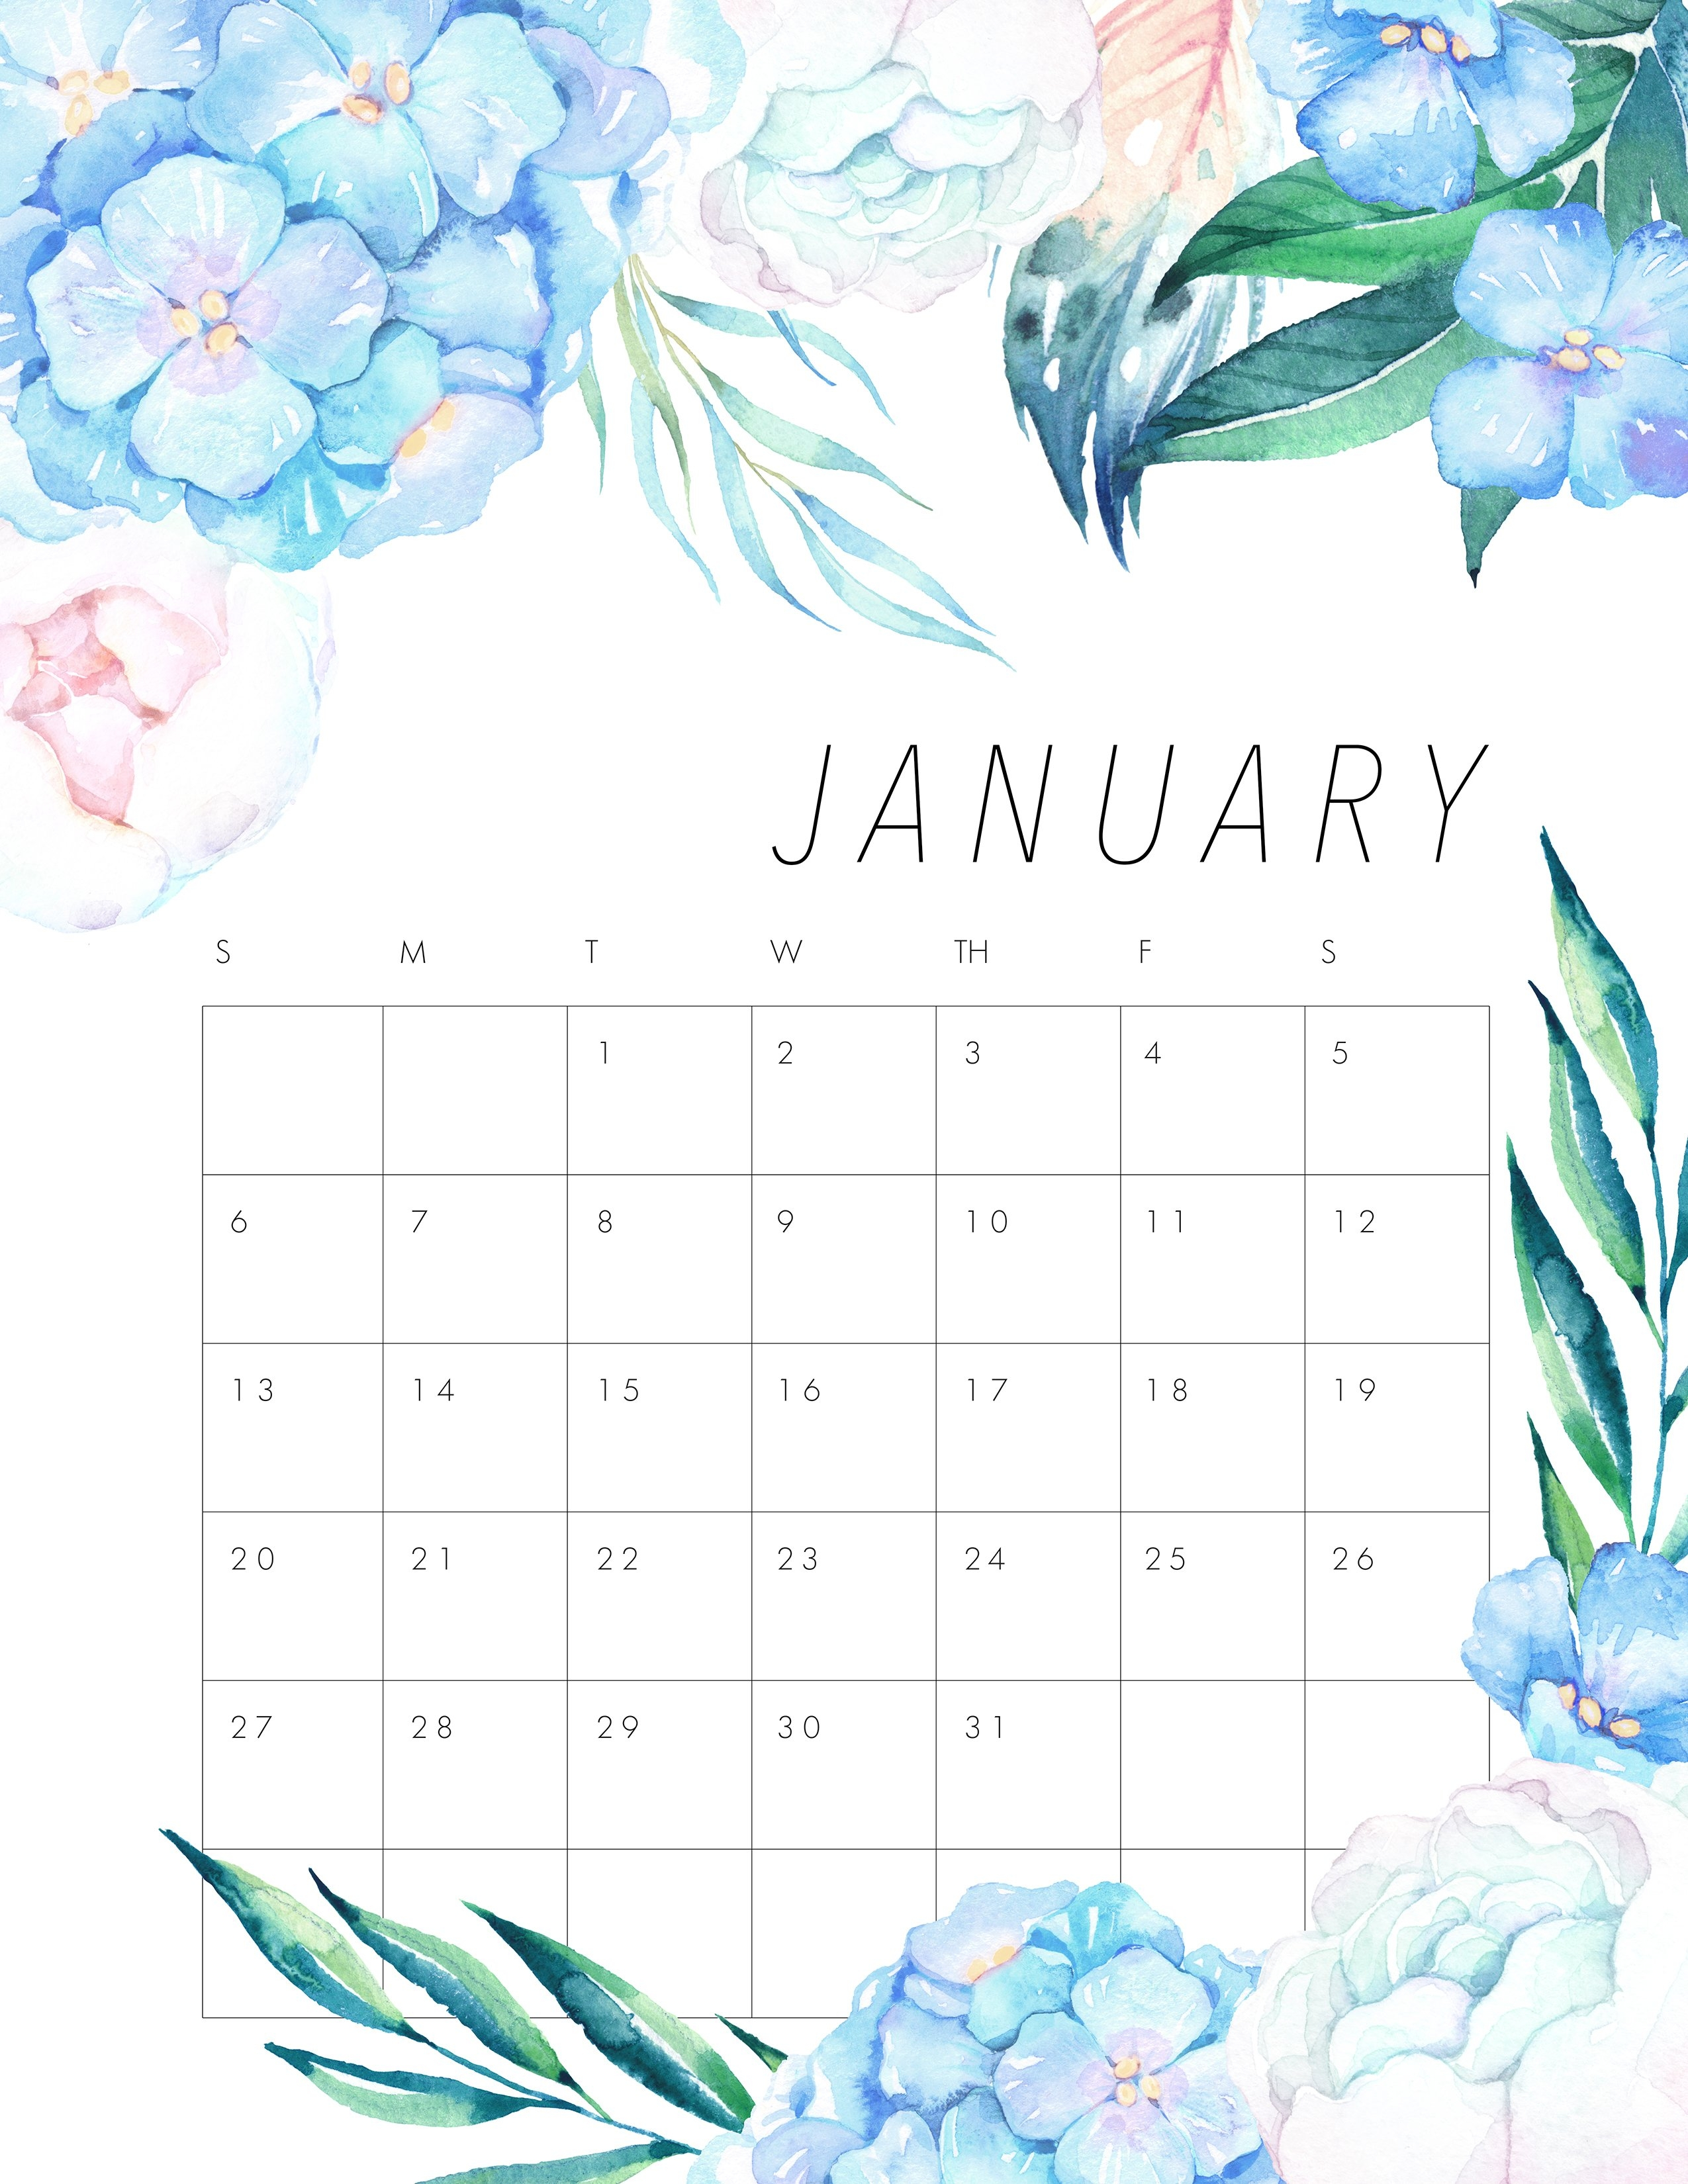 Free Printable 2019 Floral Calendar - The Cottage Market 2019 Calendar 8.5 X 11 Printable